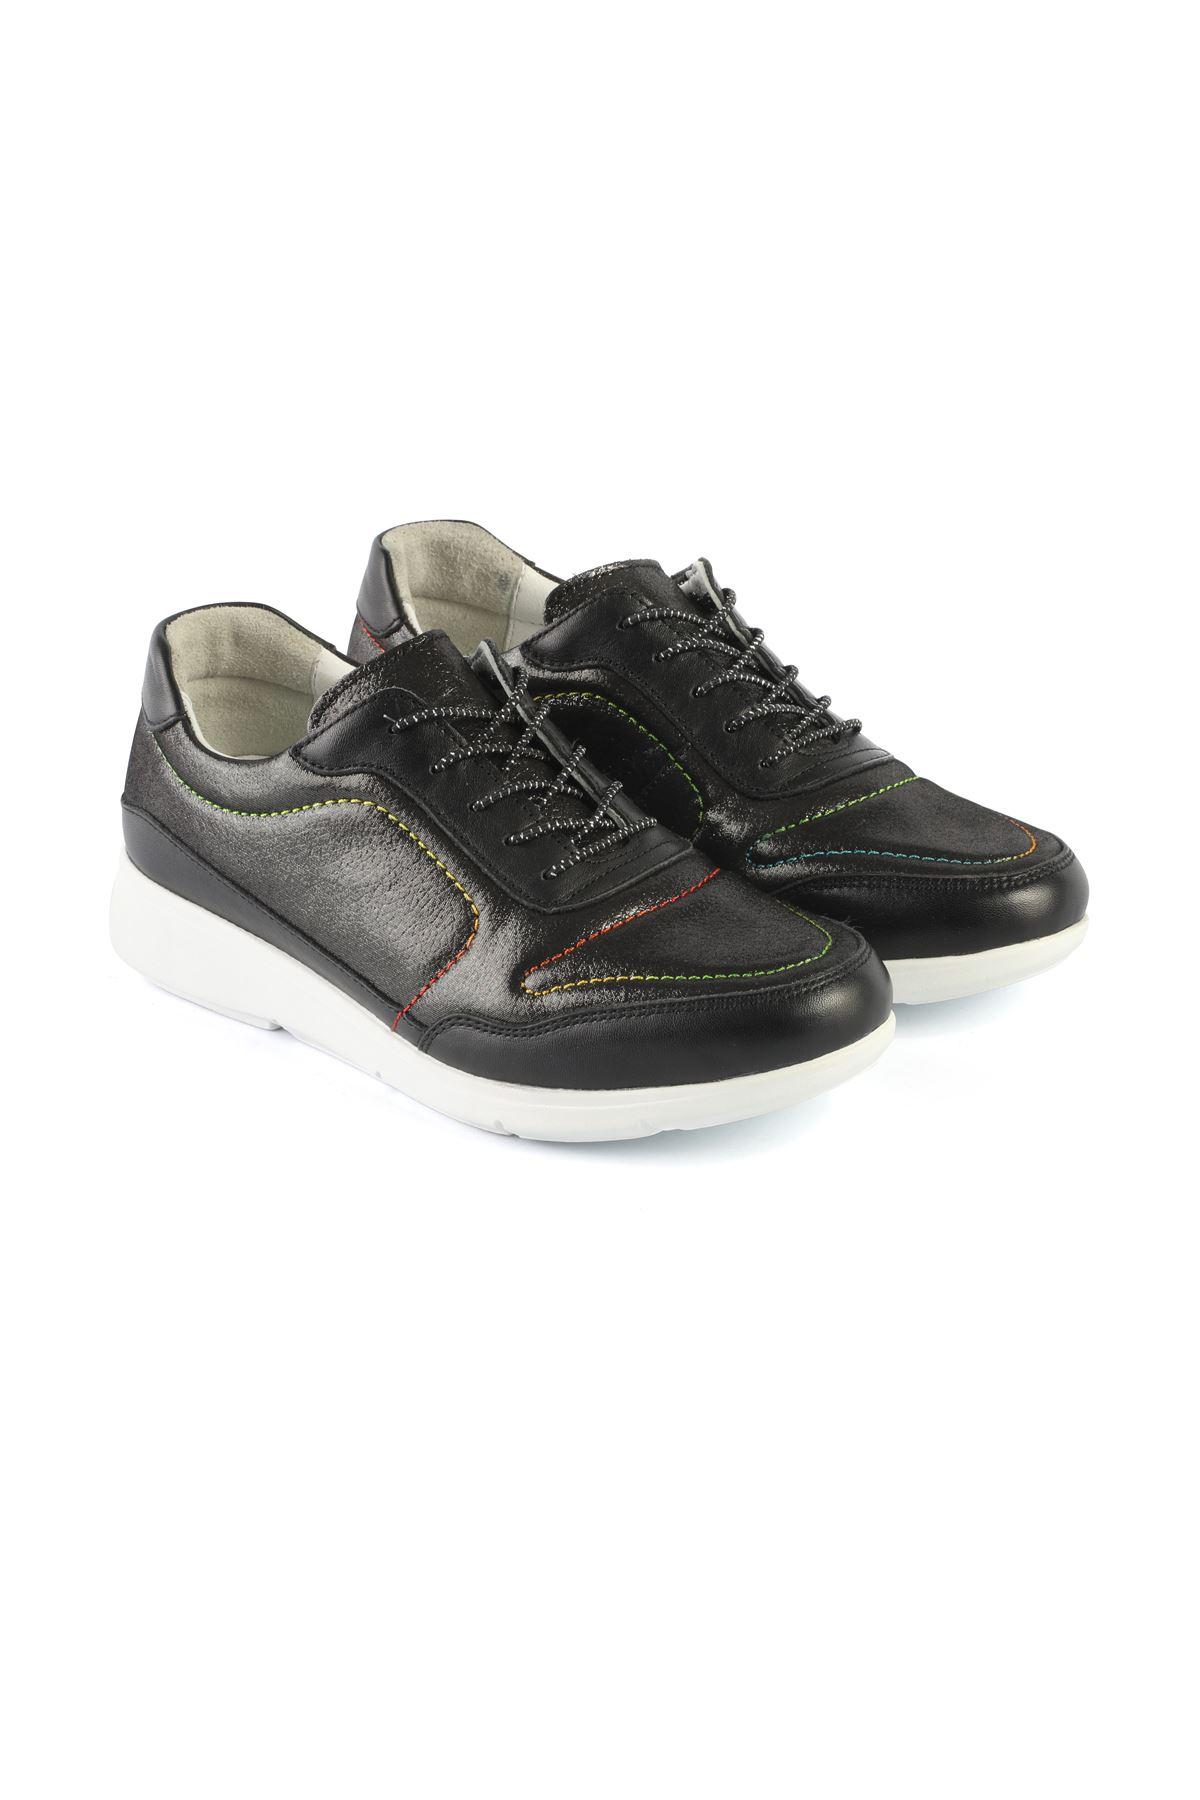 Libero AE0082 Siyah Spor Ayakkabı